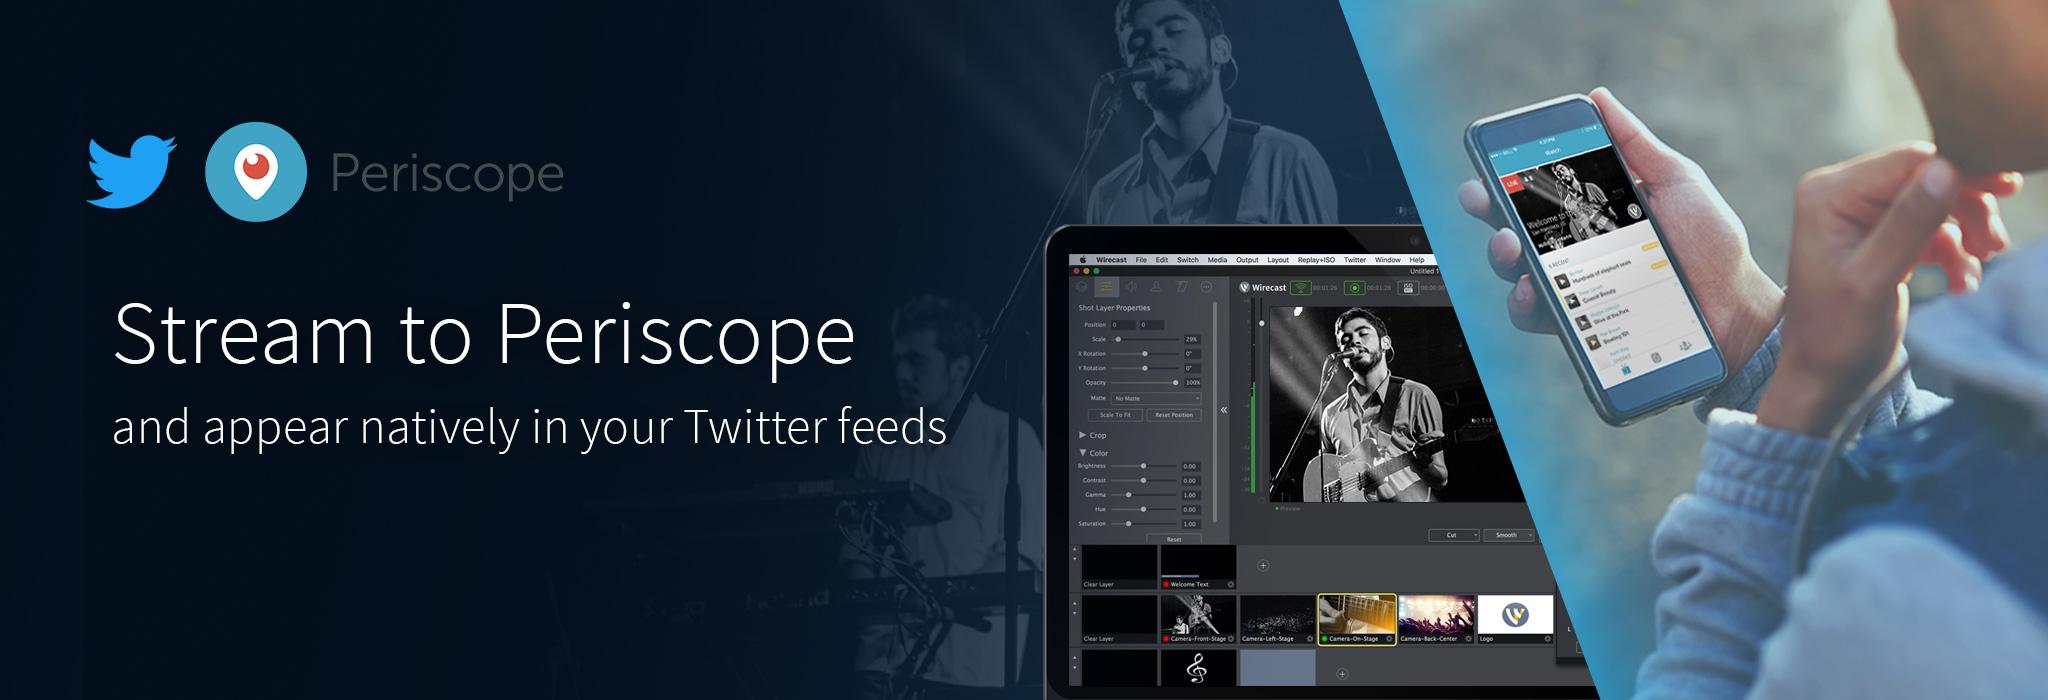 wirecast twitter periscope